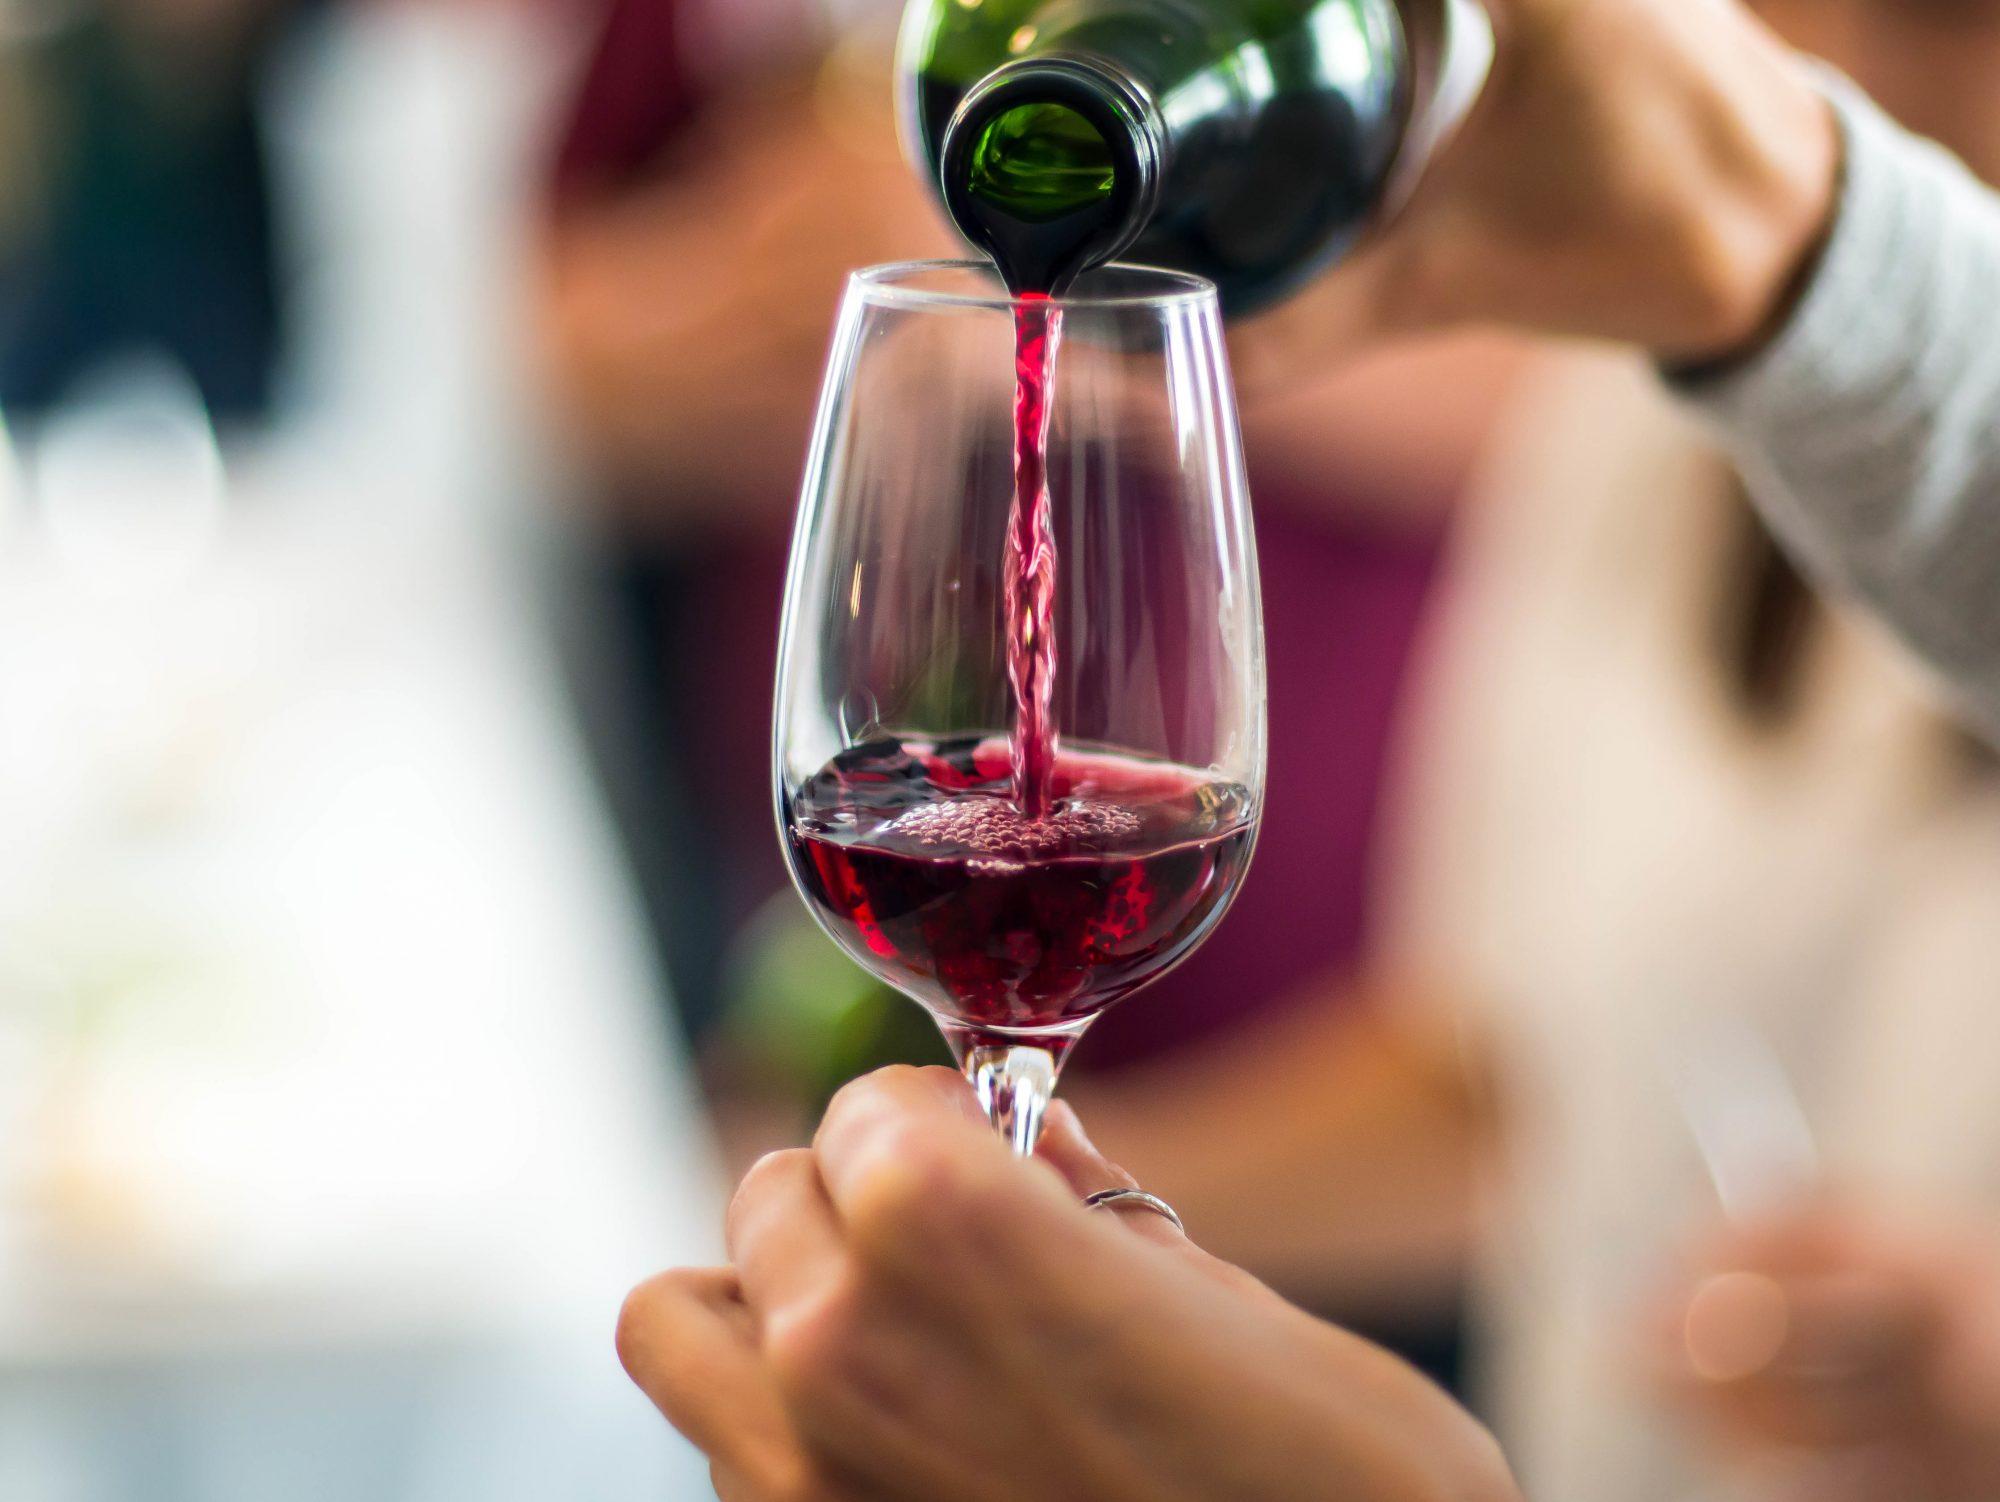 Aldi Wants You to Take Their Free Online Wine Class